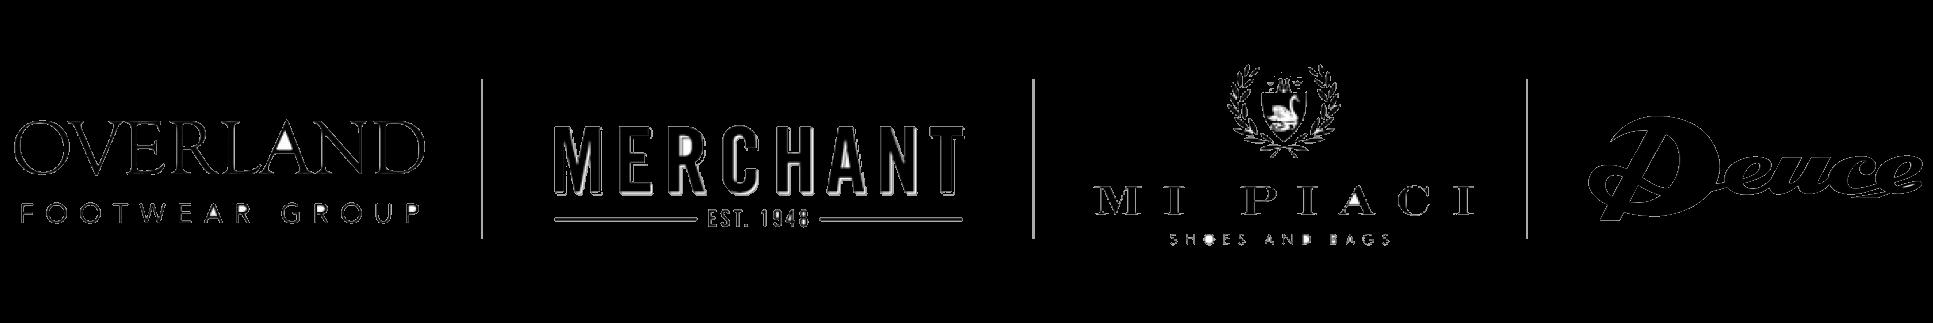 Overland Footwear Group